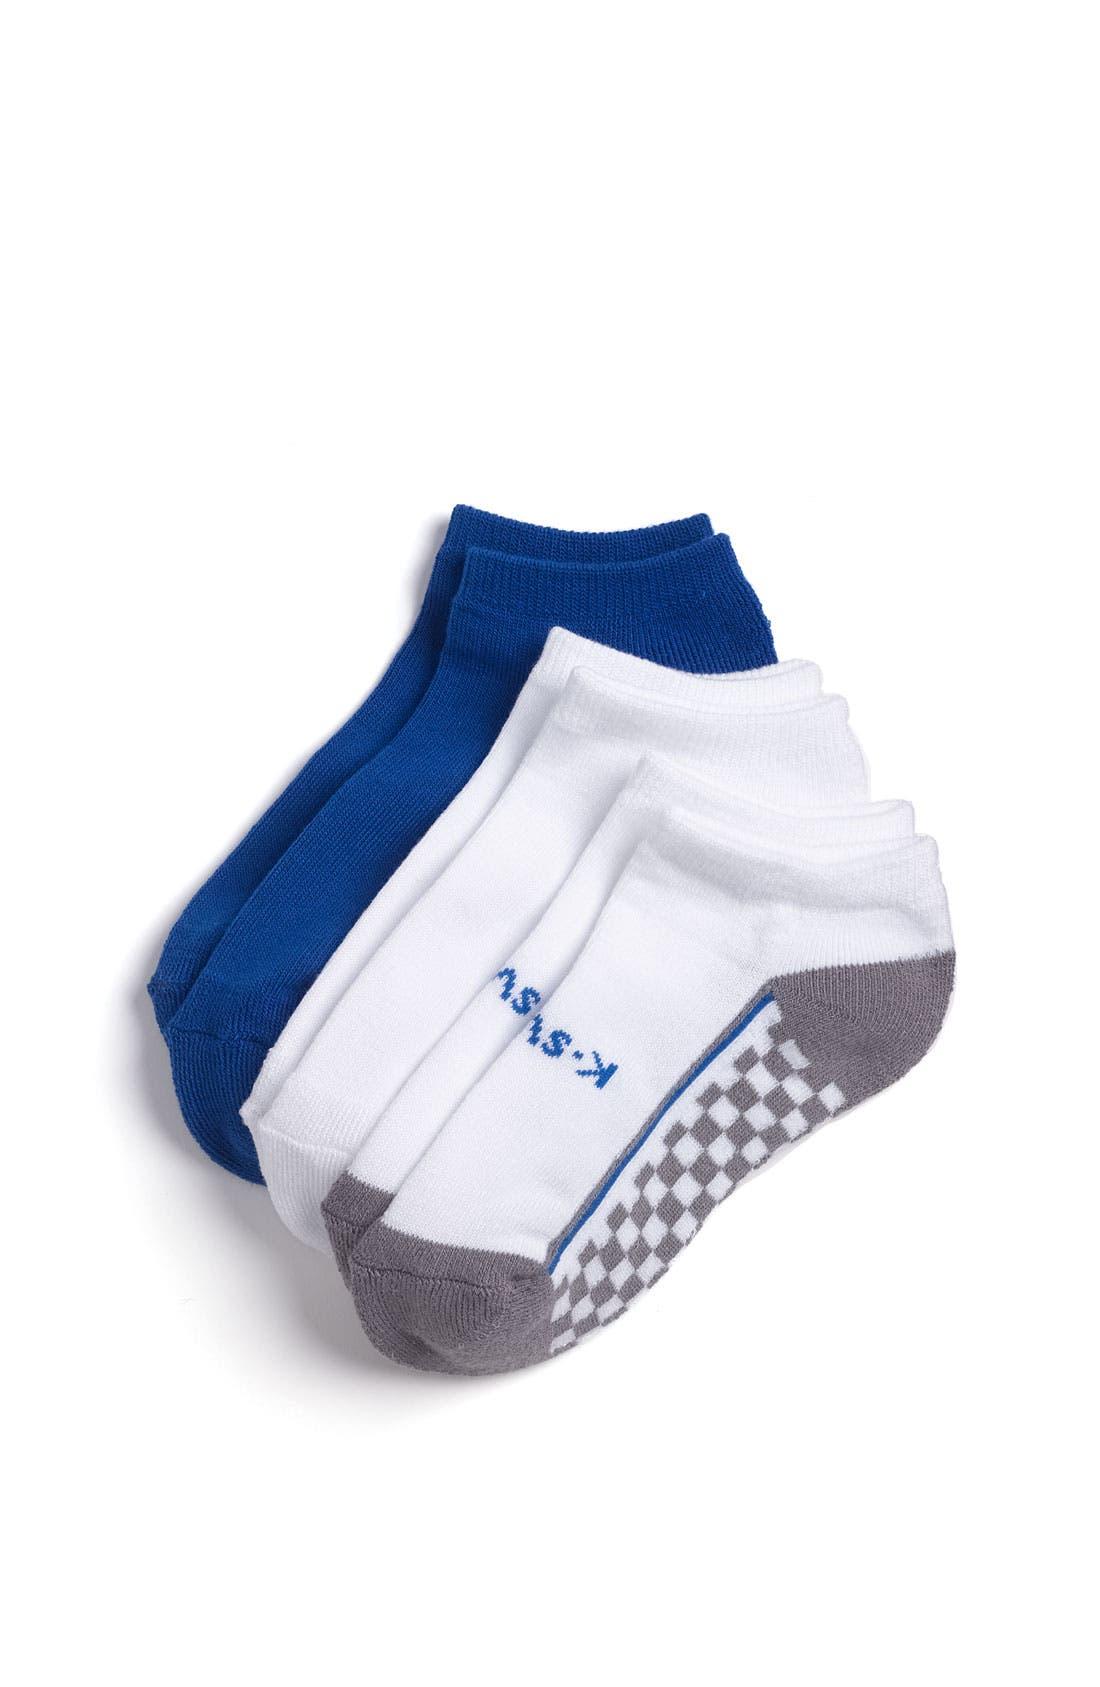 Main Image - K-Swiss 'Racing Check' Socks (3-Pack) (Big Boys)